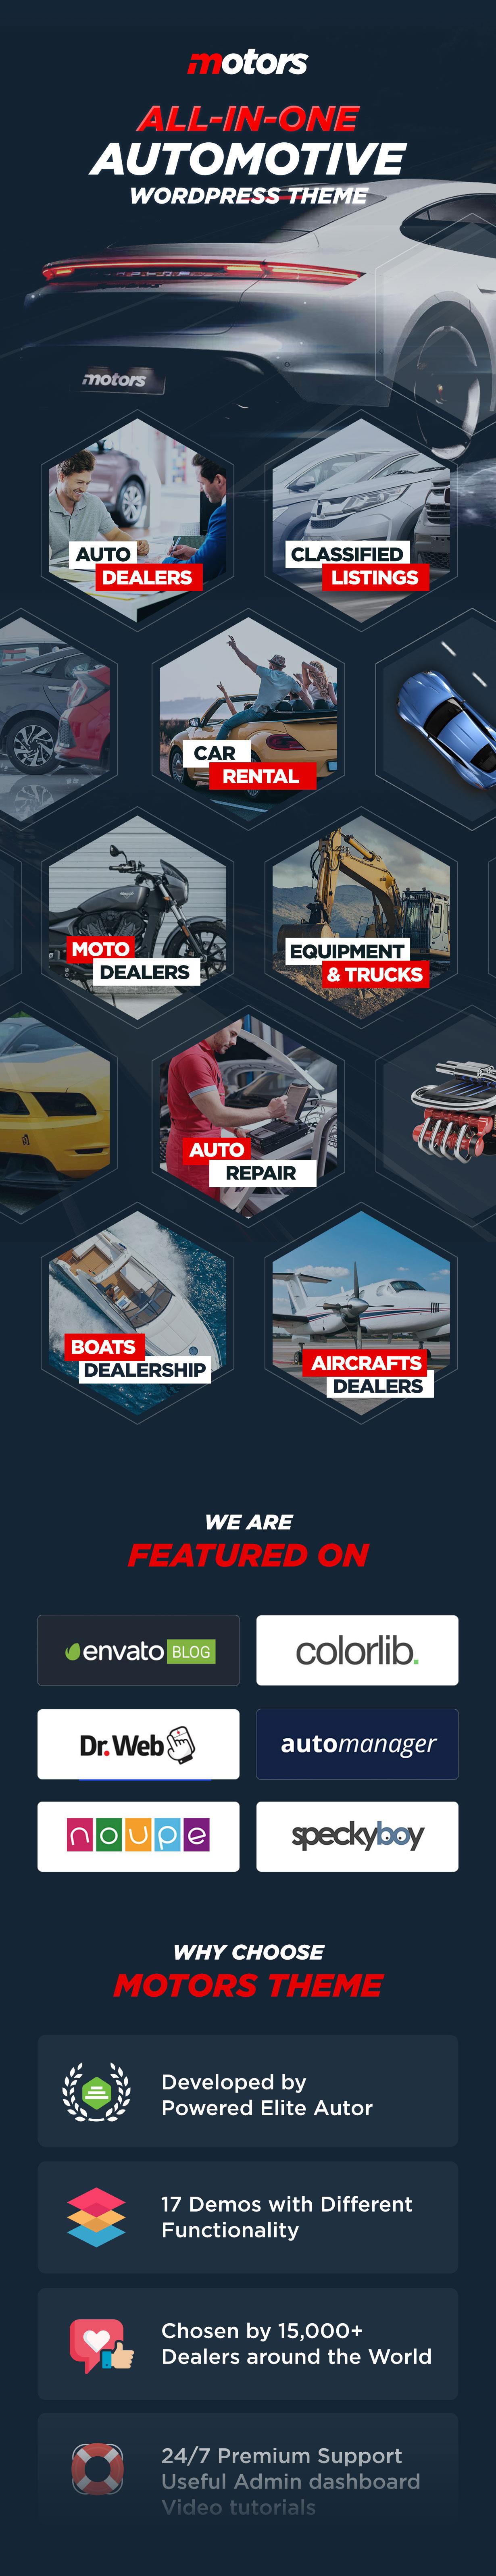 Motors - Car Dealer, Rental & Listing WordPress theme - 1